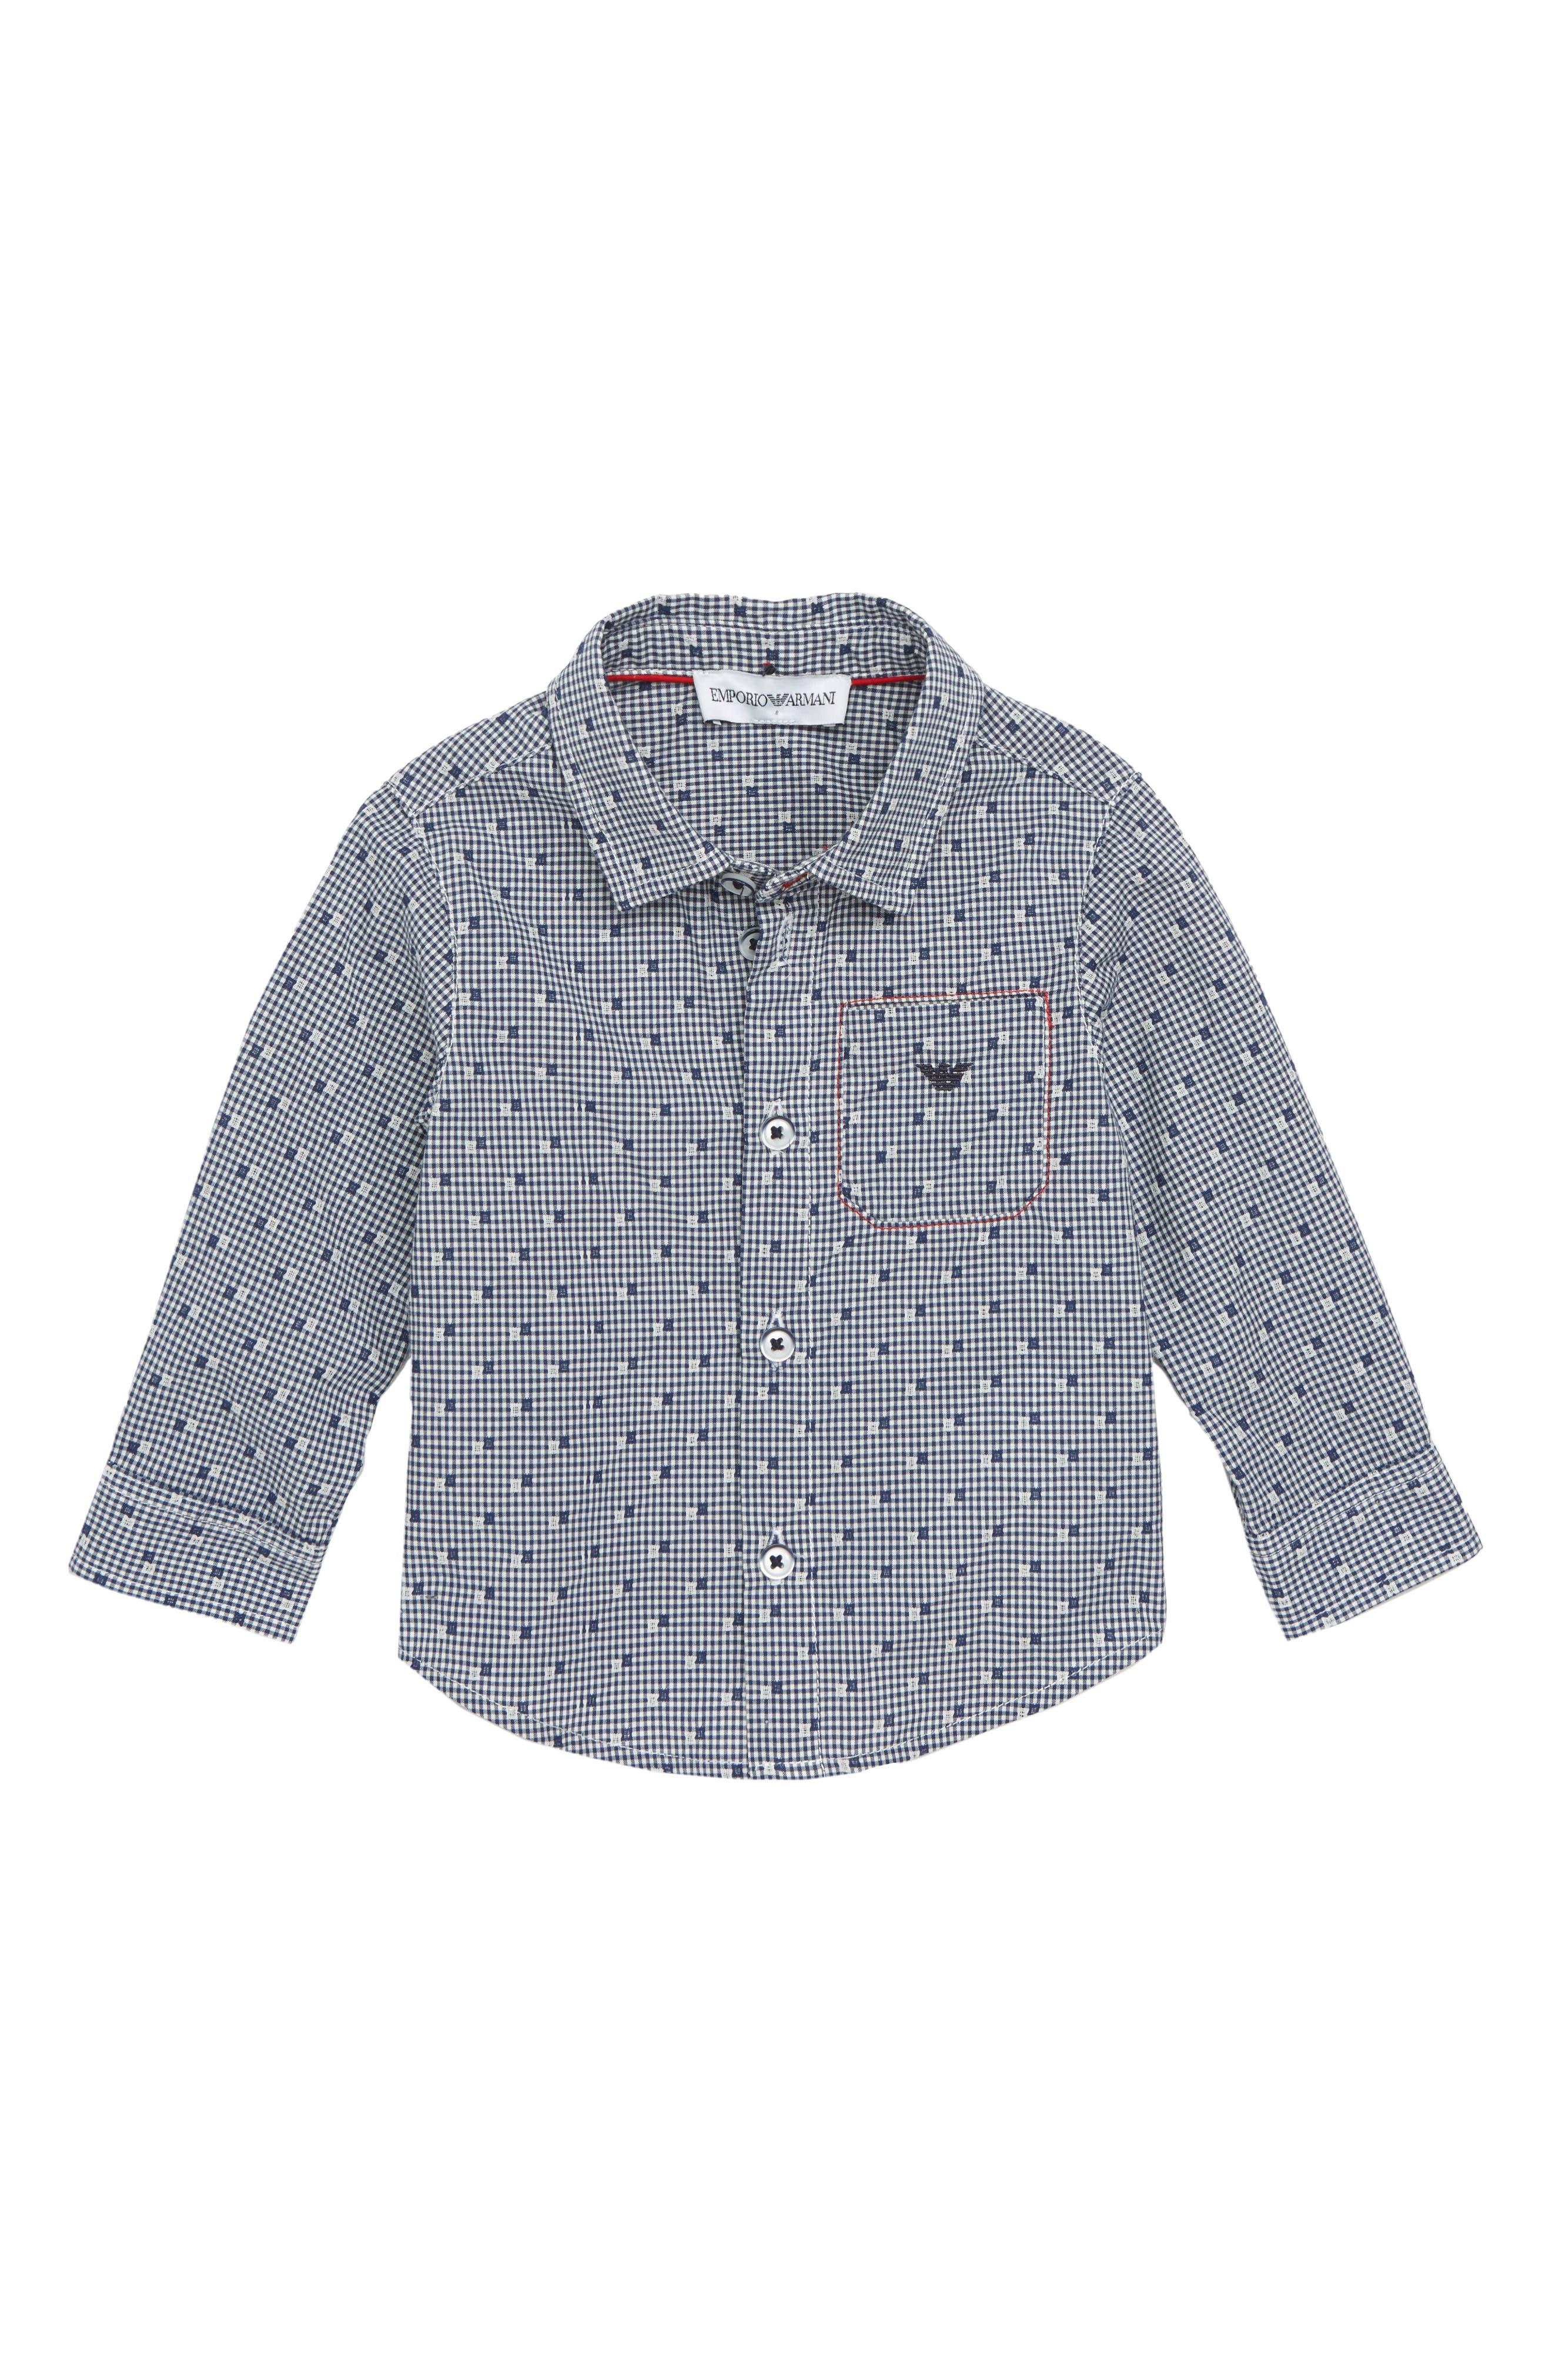 ARMANI JUNIOR Micro Dot Shirt, Main, color, 401